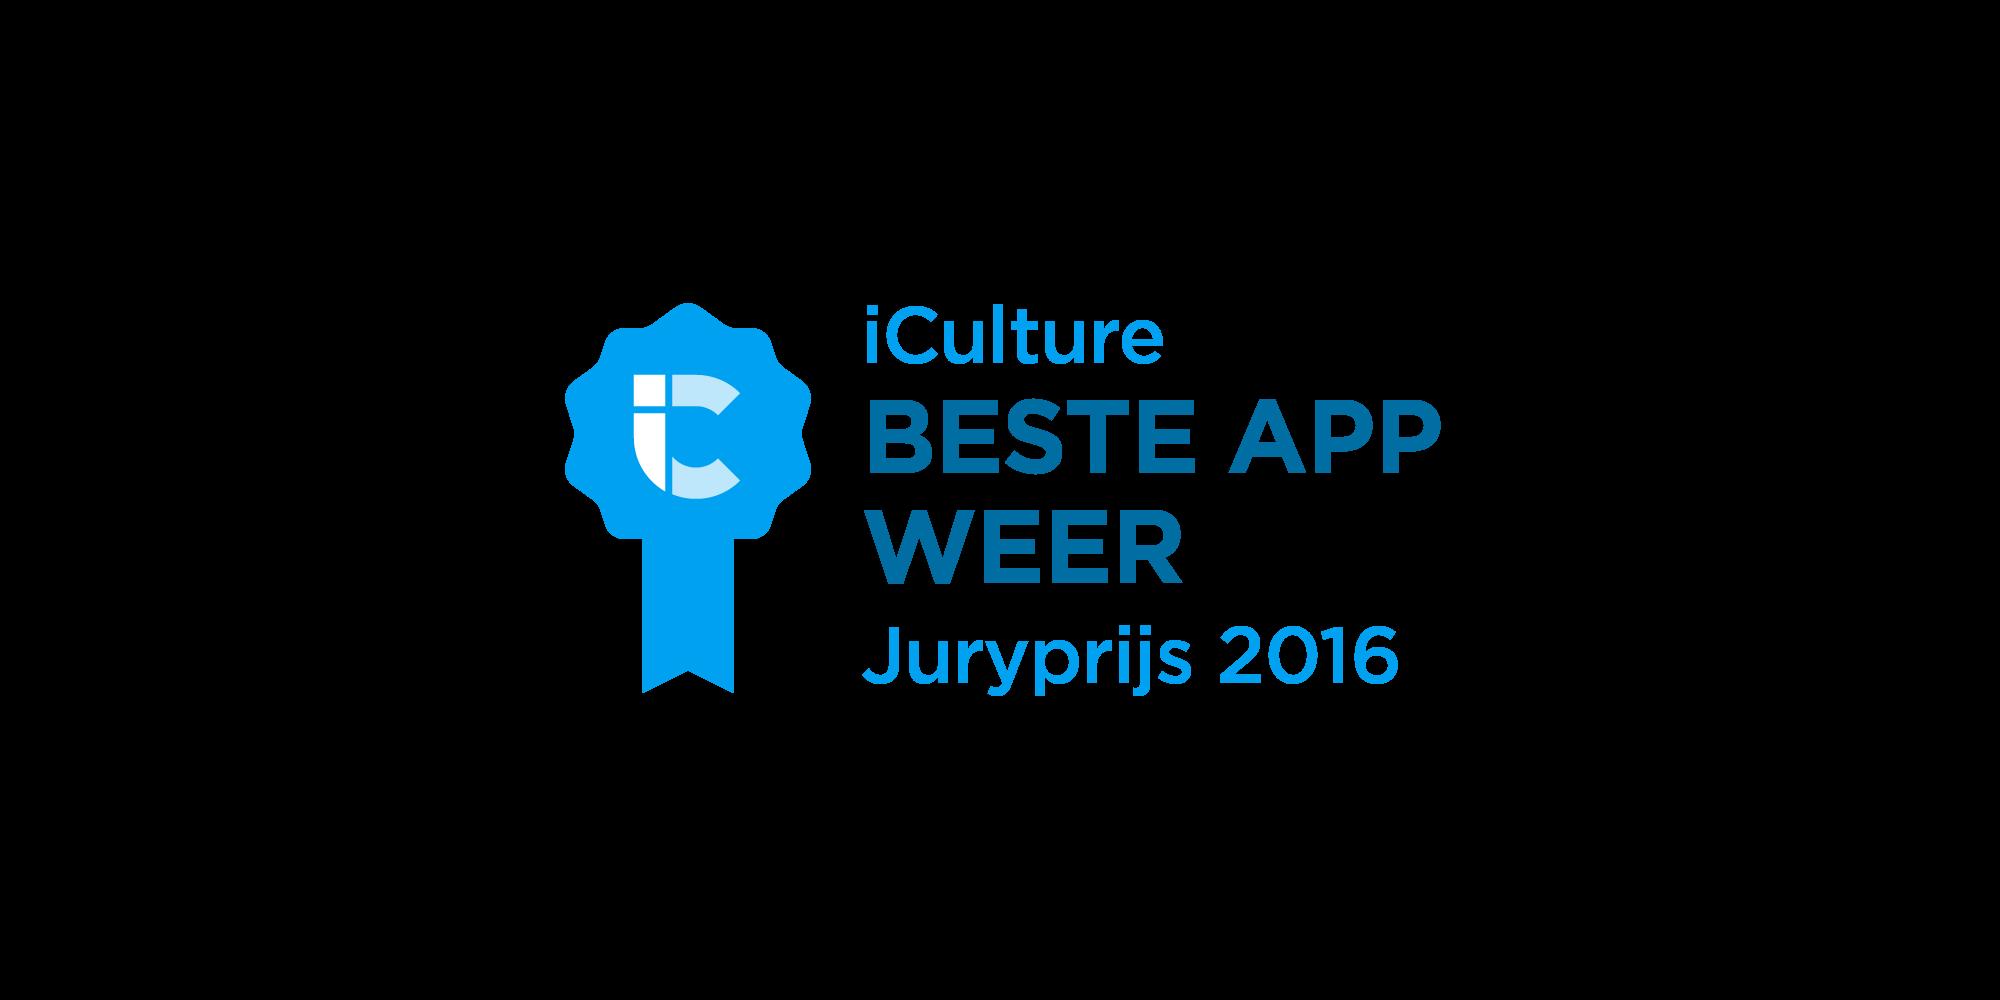 iCulture Beste App Weer 2016